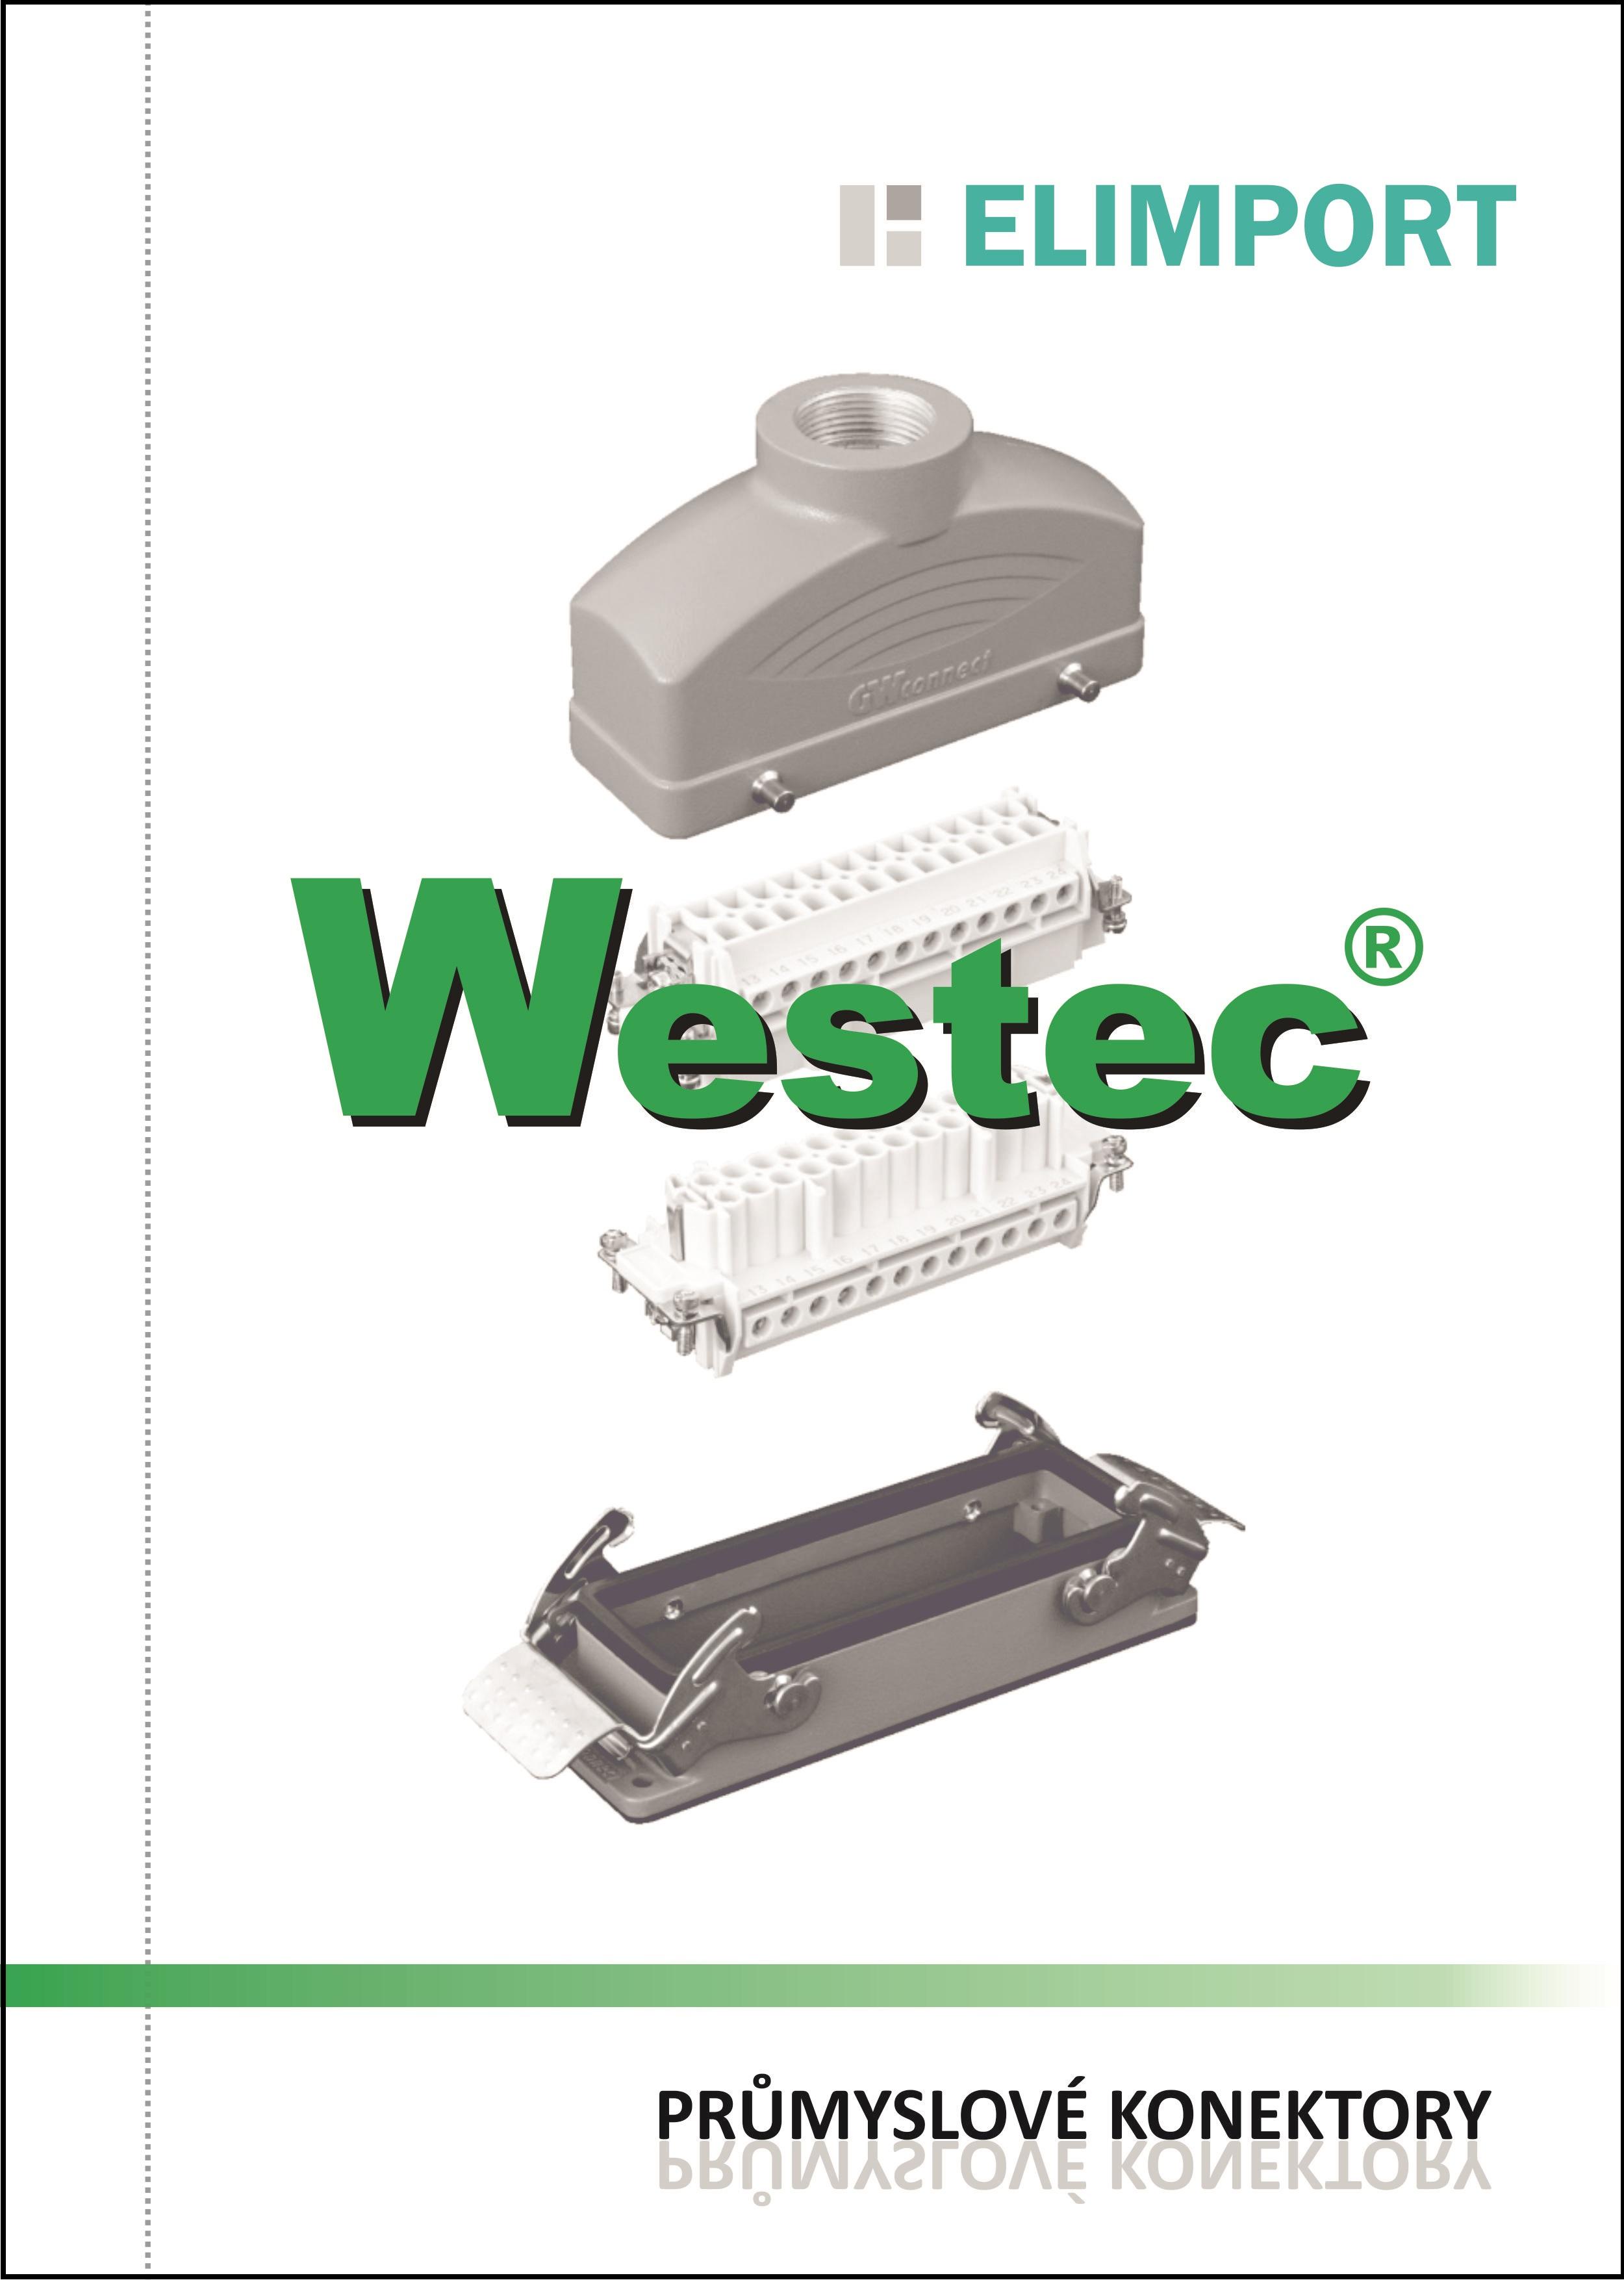 Westec Elimport